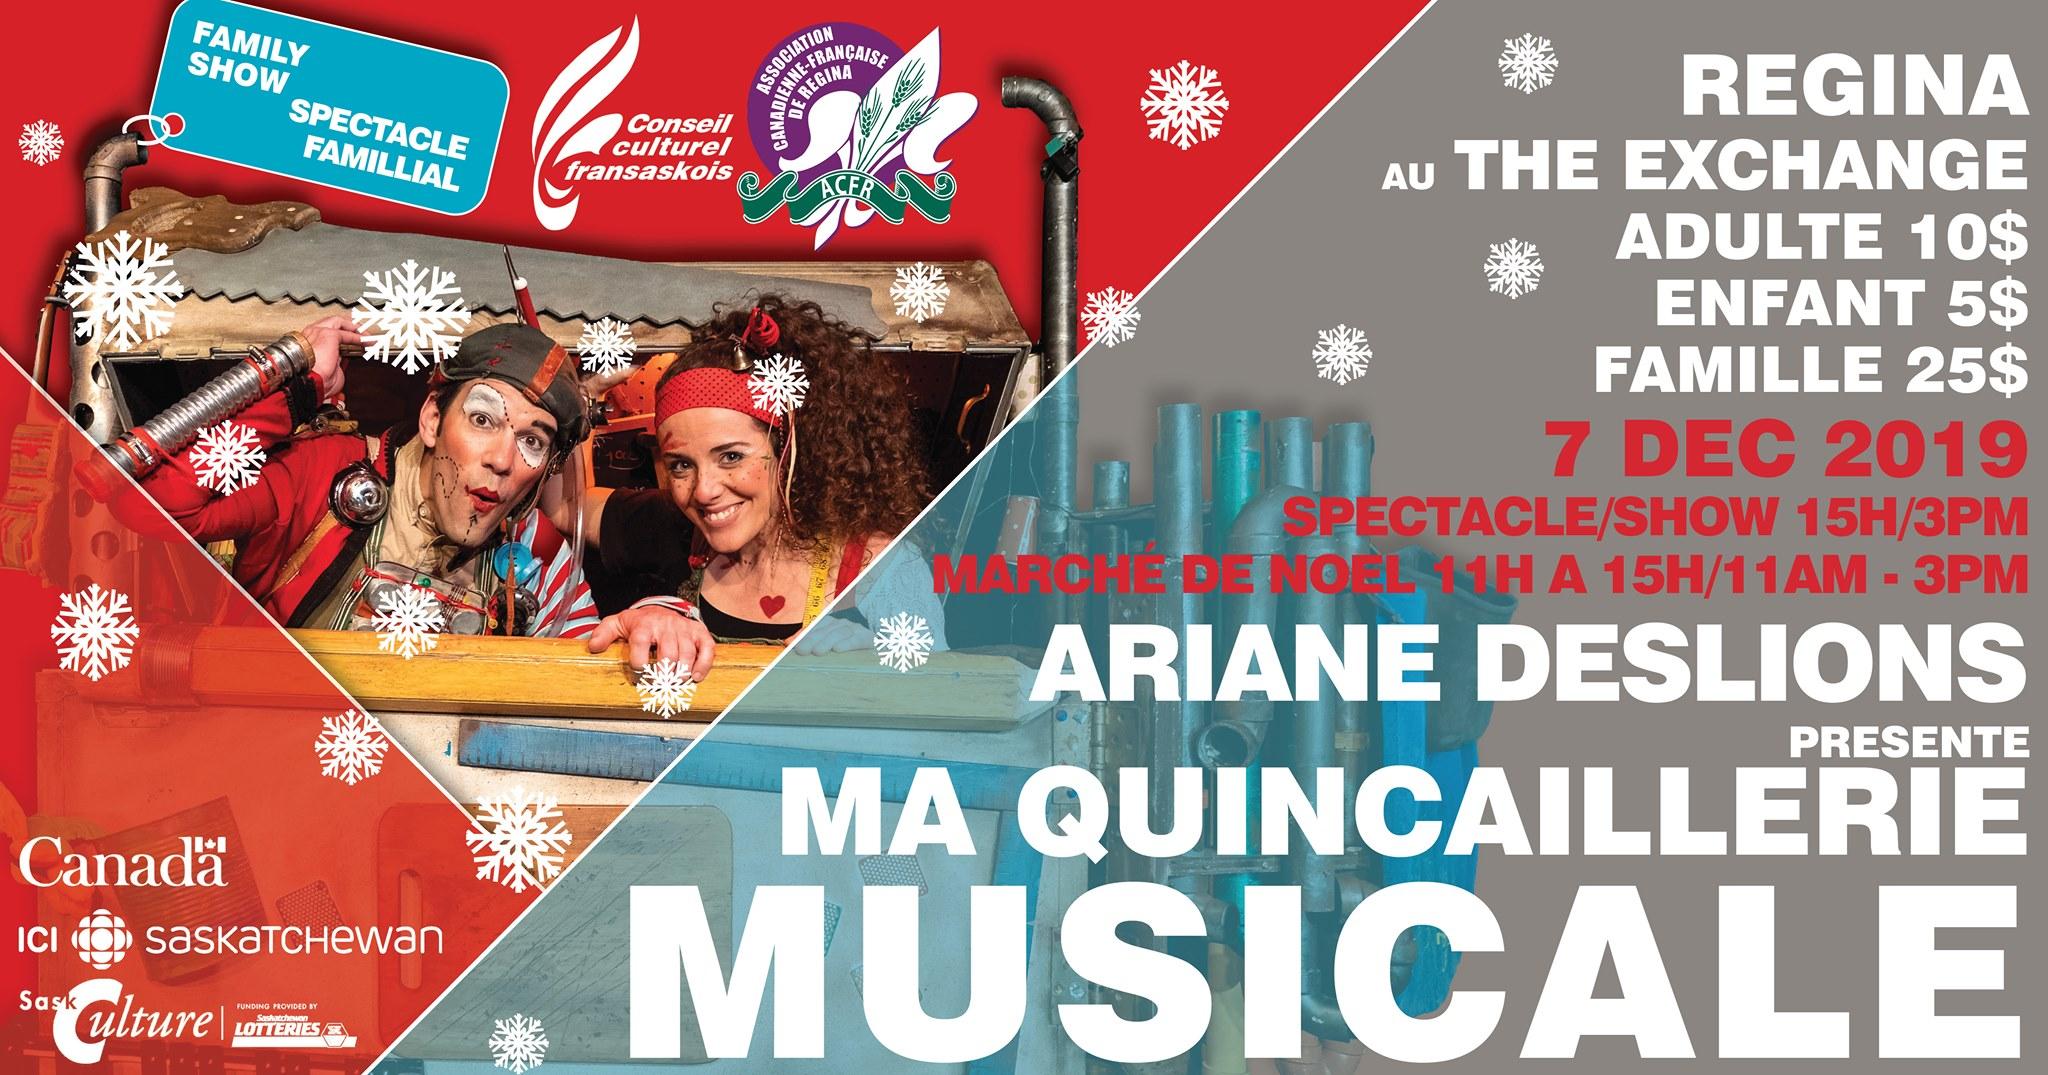 Marché de Noël & Spectacle Ma Quincaillerie musicale à Regina